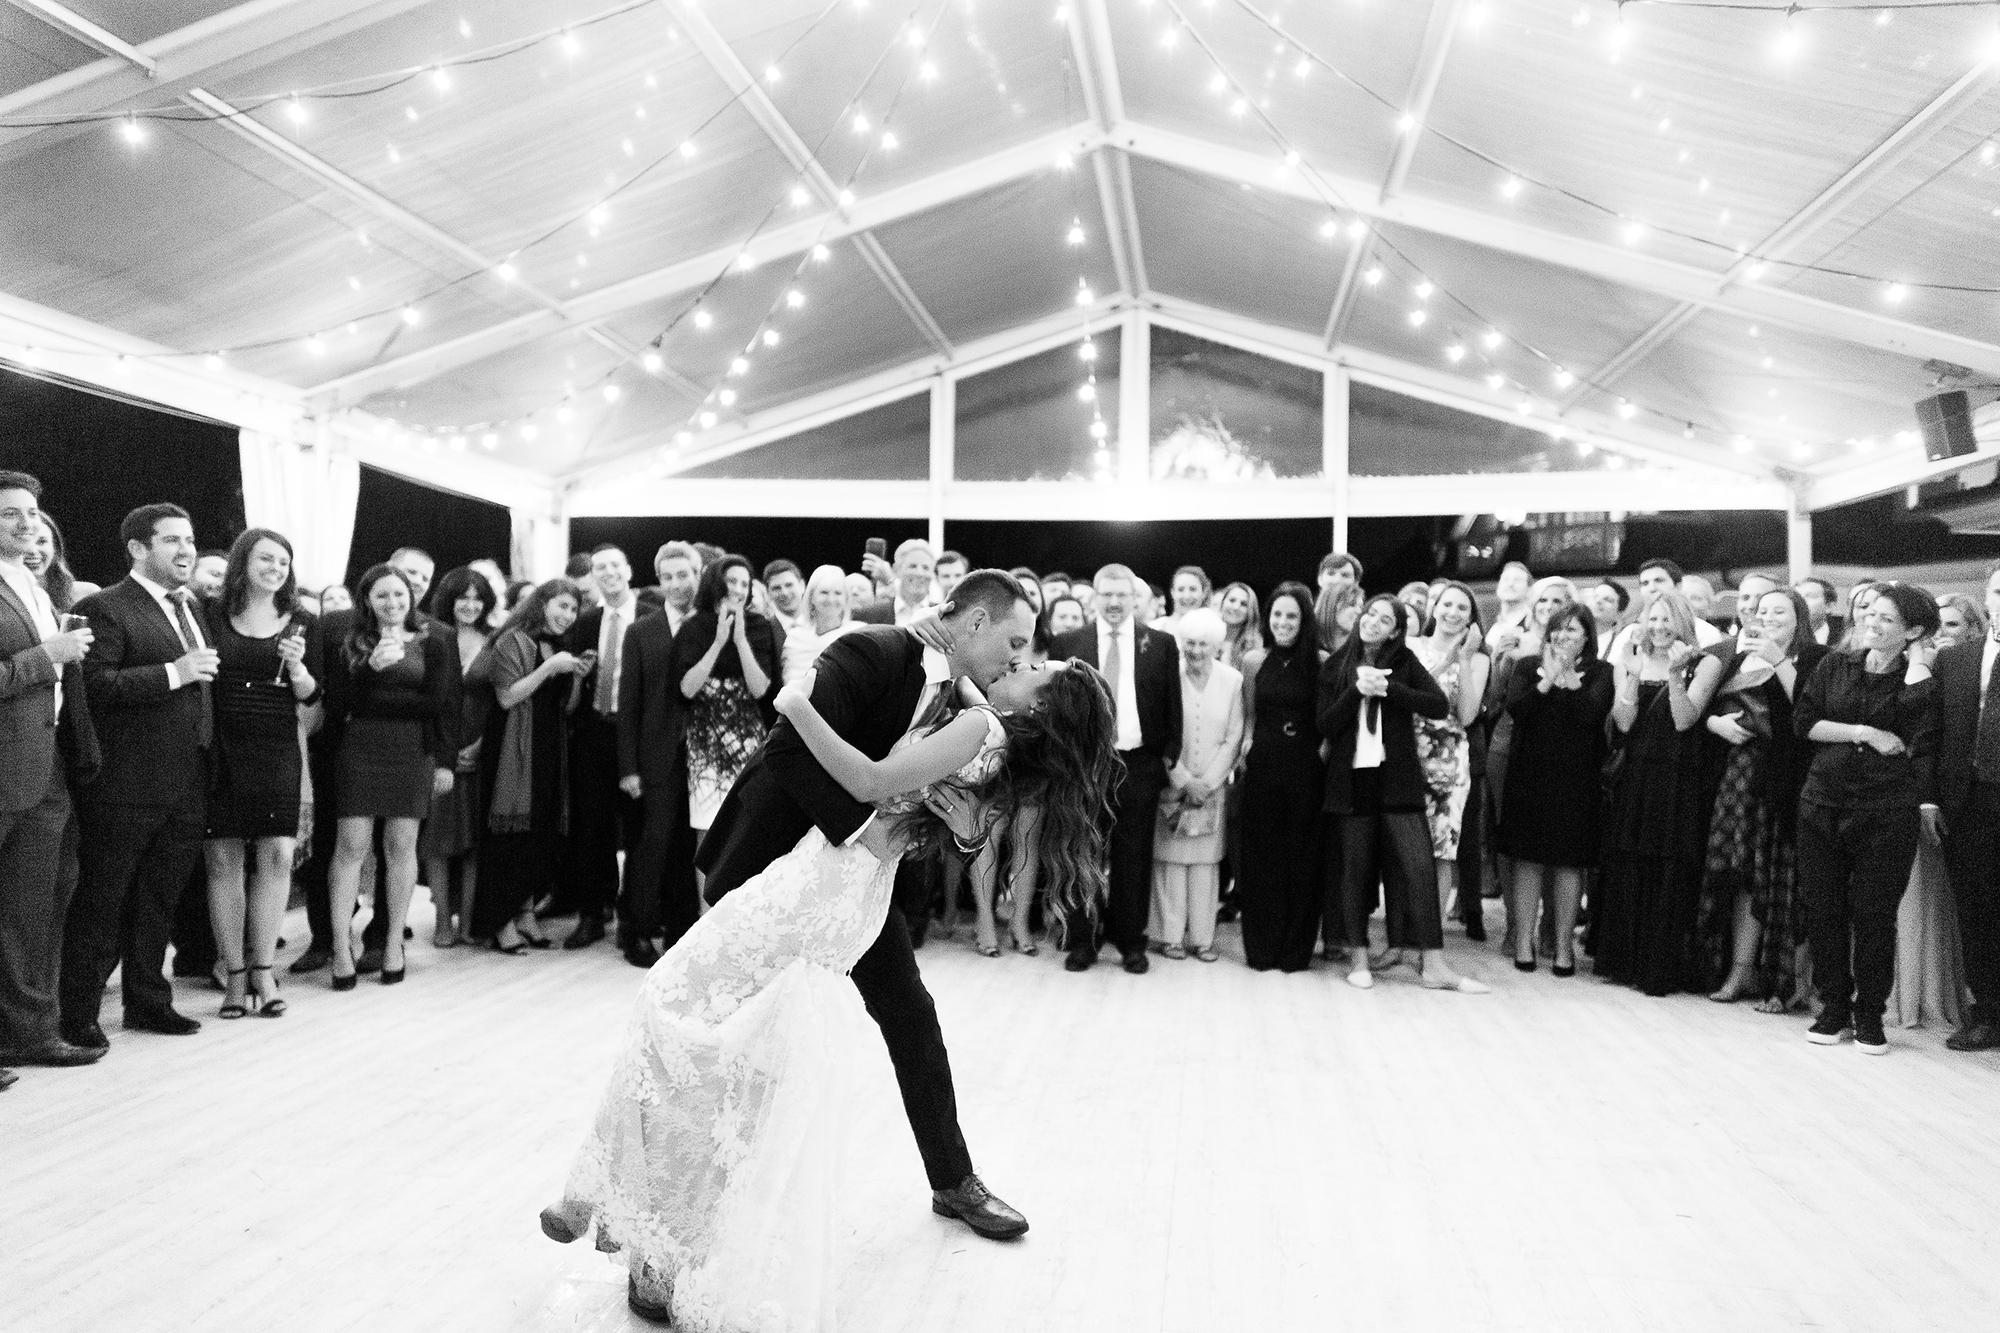 012_Garden Wedding Dance Black and White_AE Events.jpeg.jpg